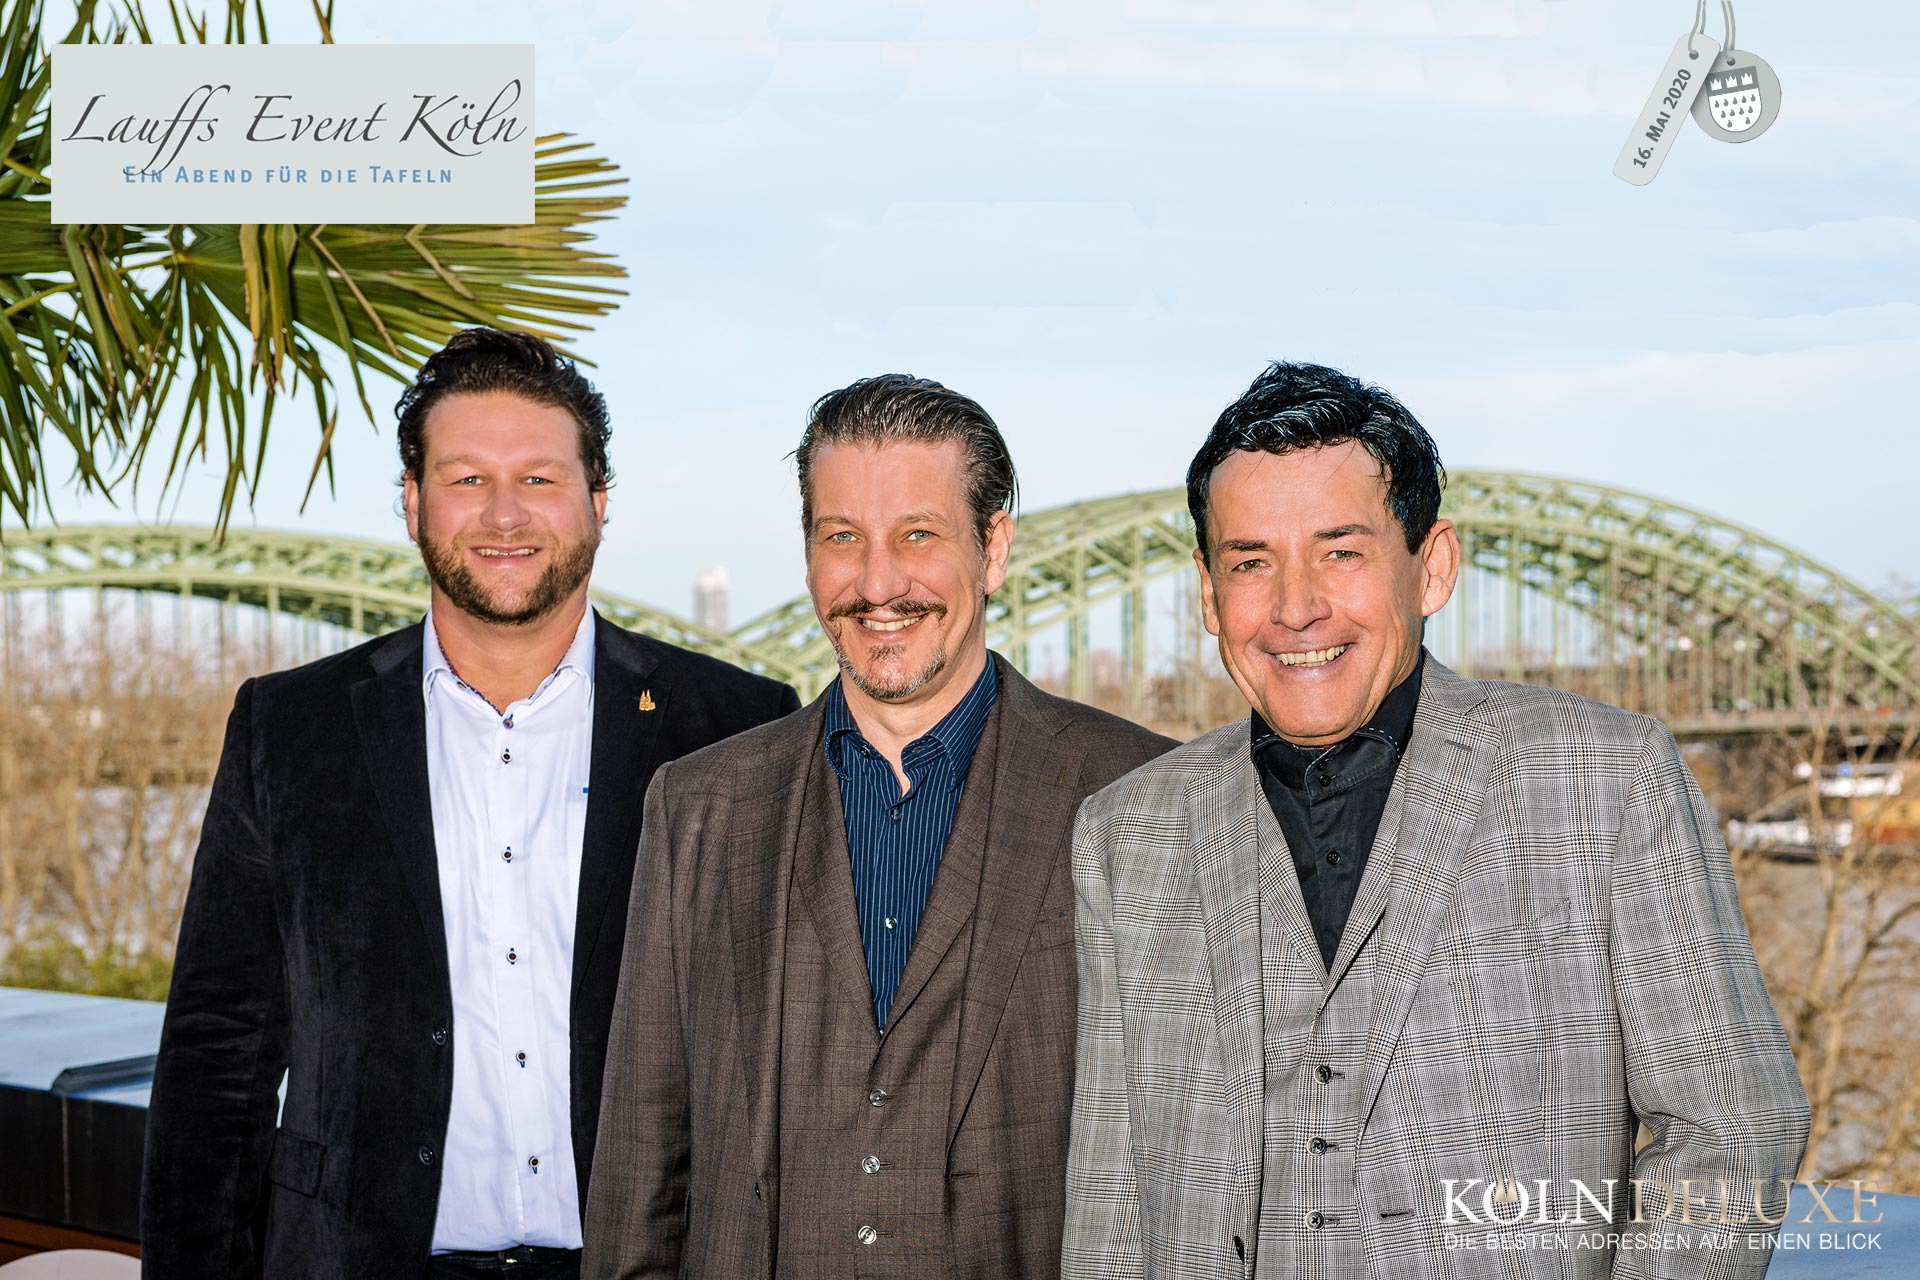 Lauffs Charity Event trifft Rheinloft Cologne & Köln Deluxe